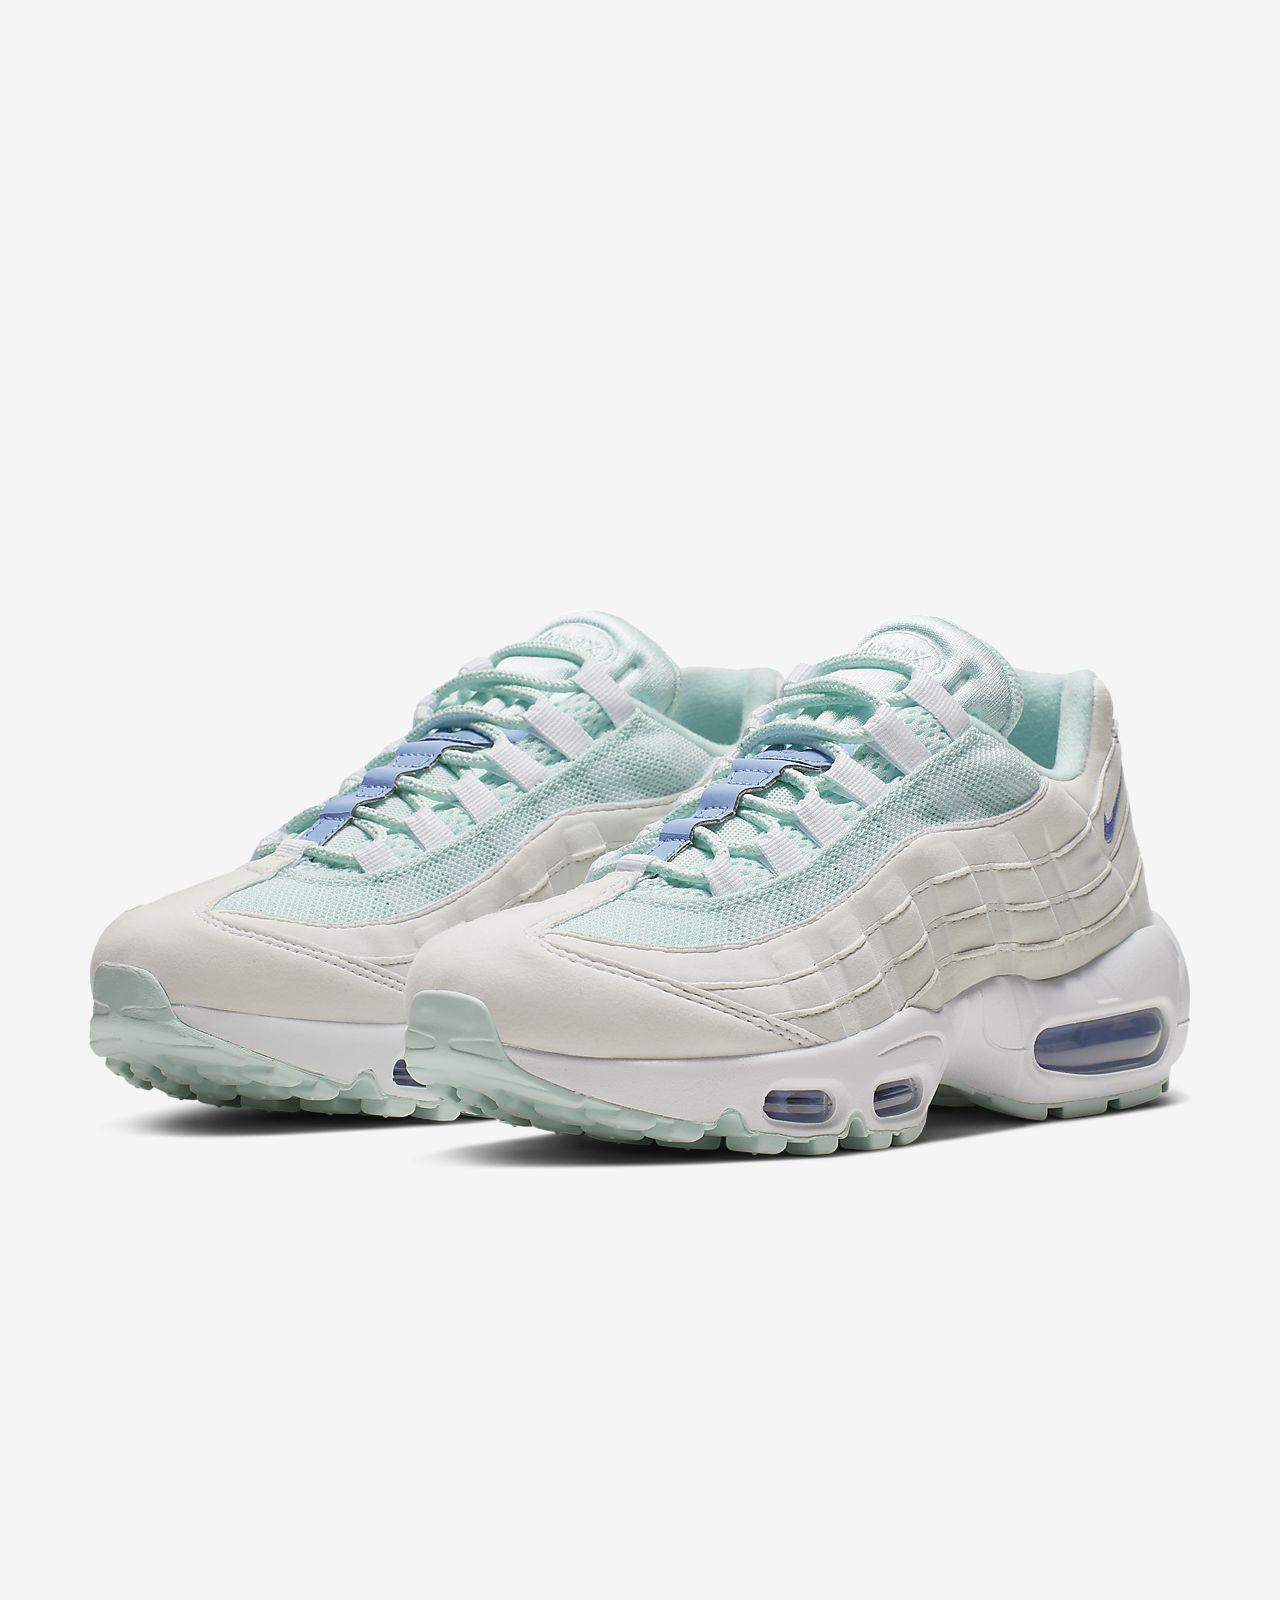 c0024a7611 Nike Air Max 95 Women's Shoe